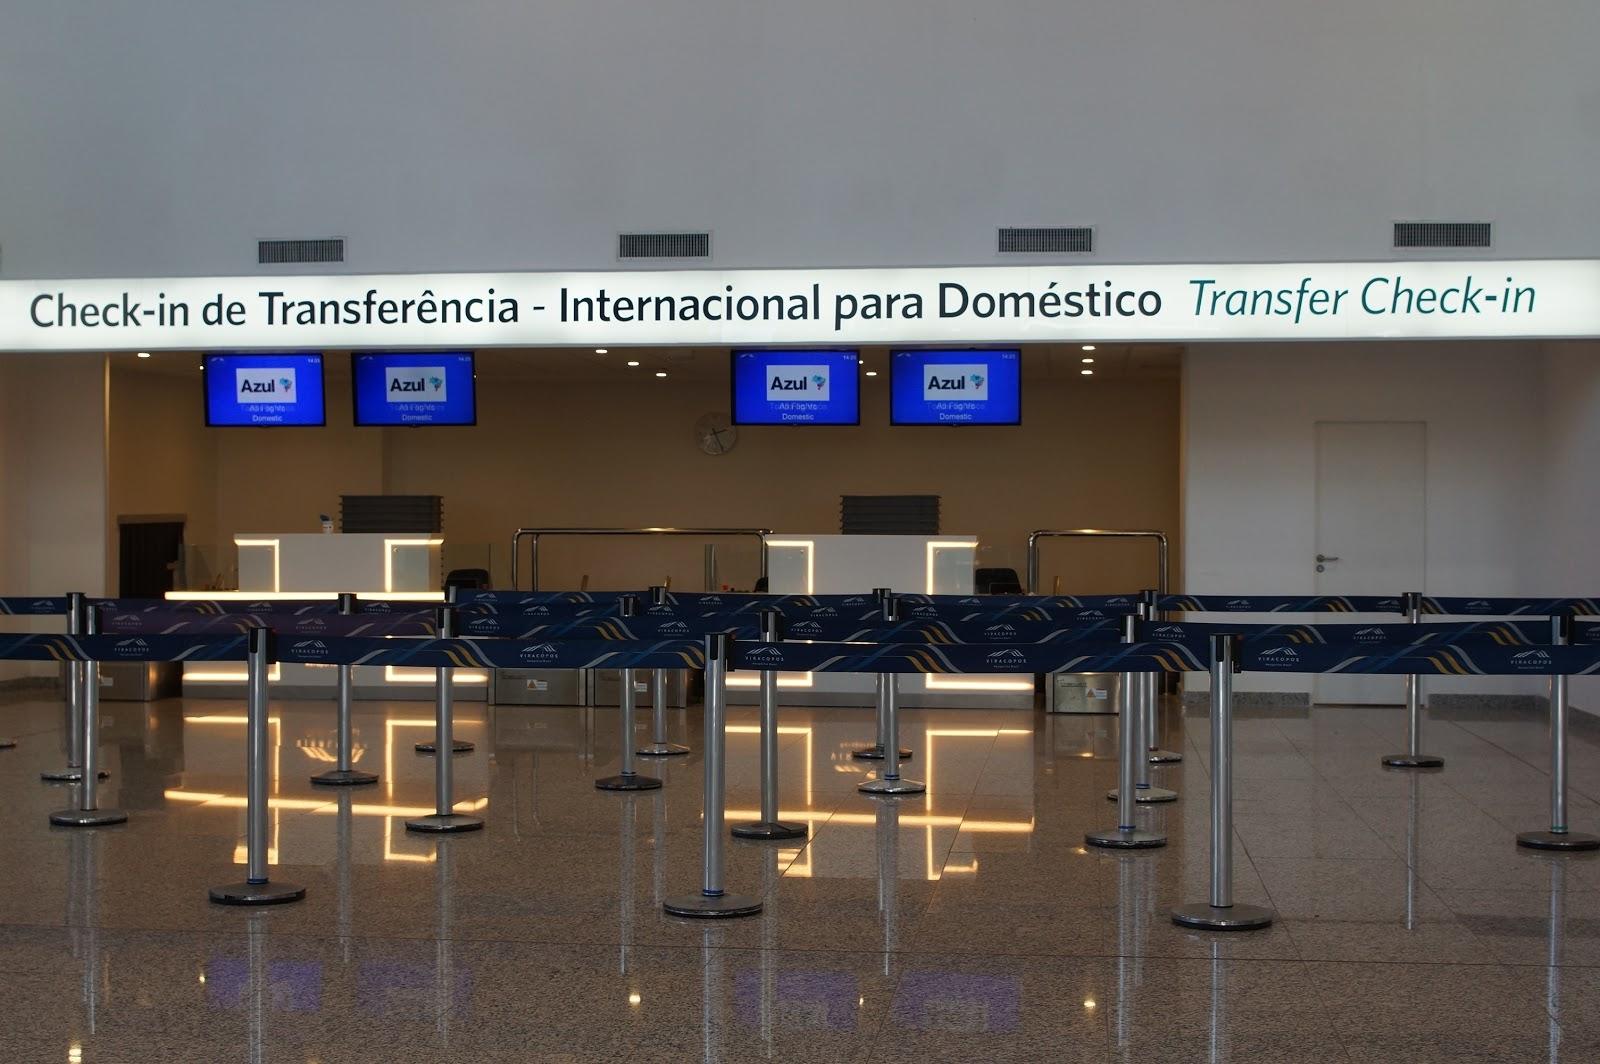 Viracopos inaugura o check-in de transferência para desembarques internacionais com voos nacionais